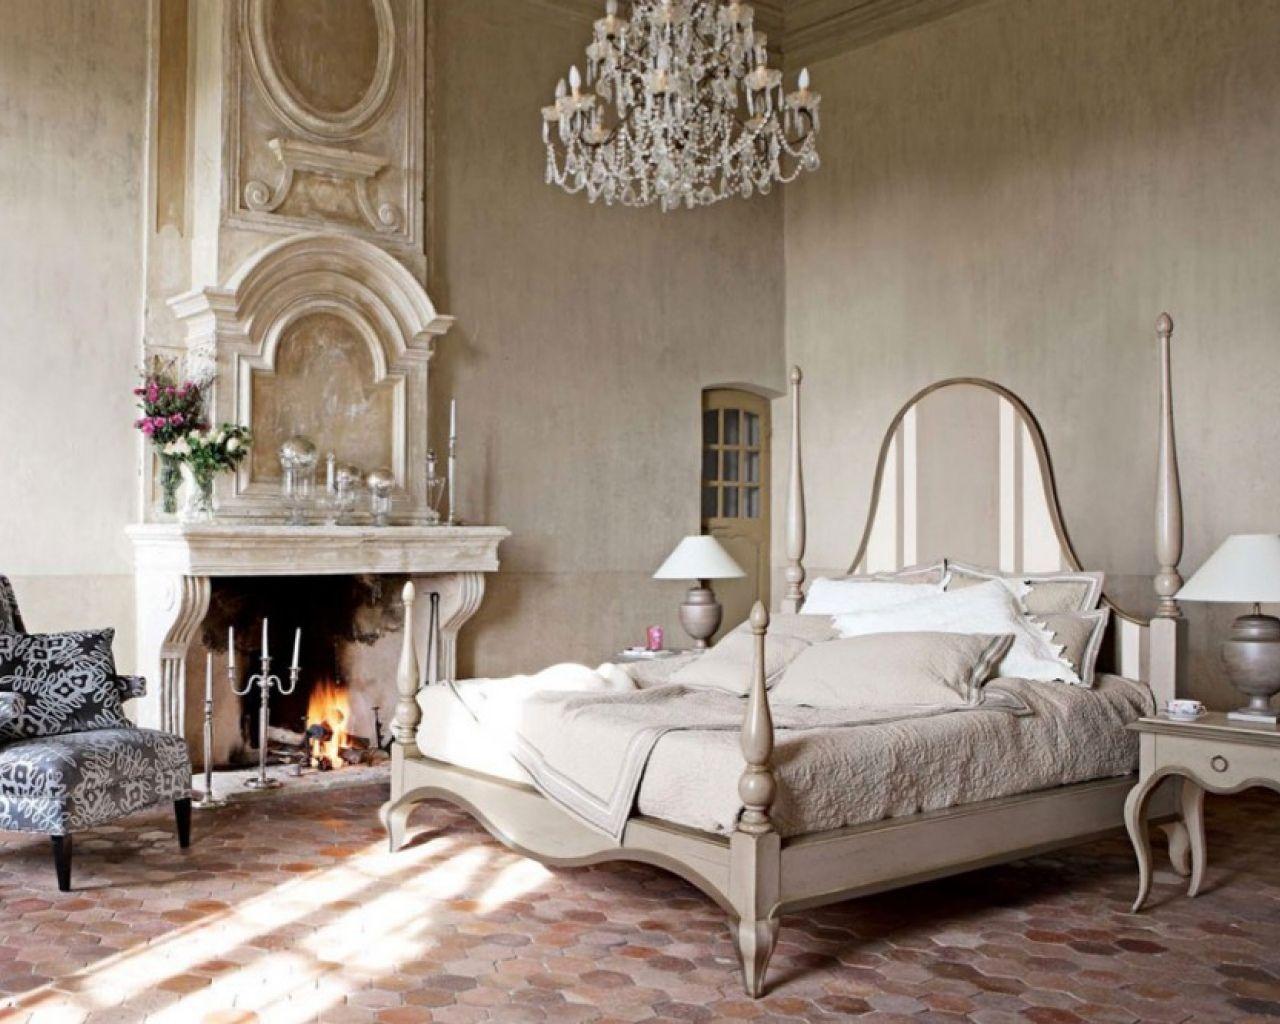 Medieval Bedroom Medieval Interior Design Bjetjtcom The Largest Collection Of